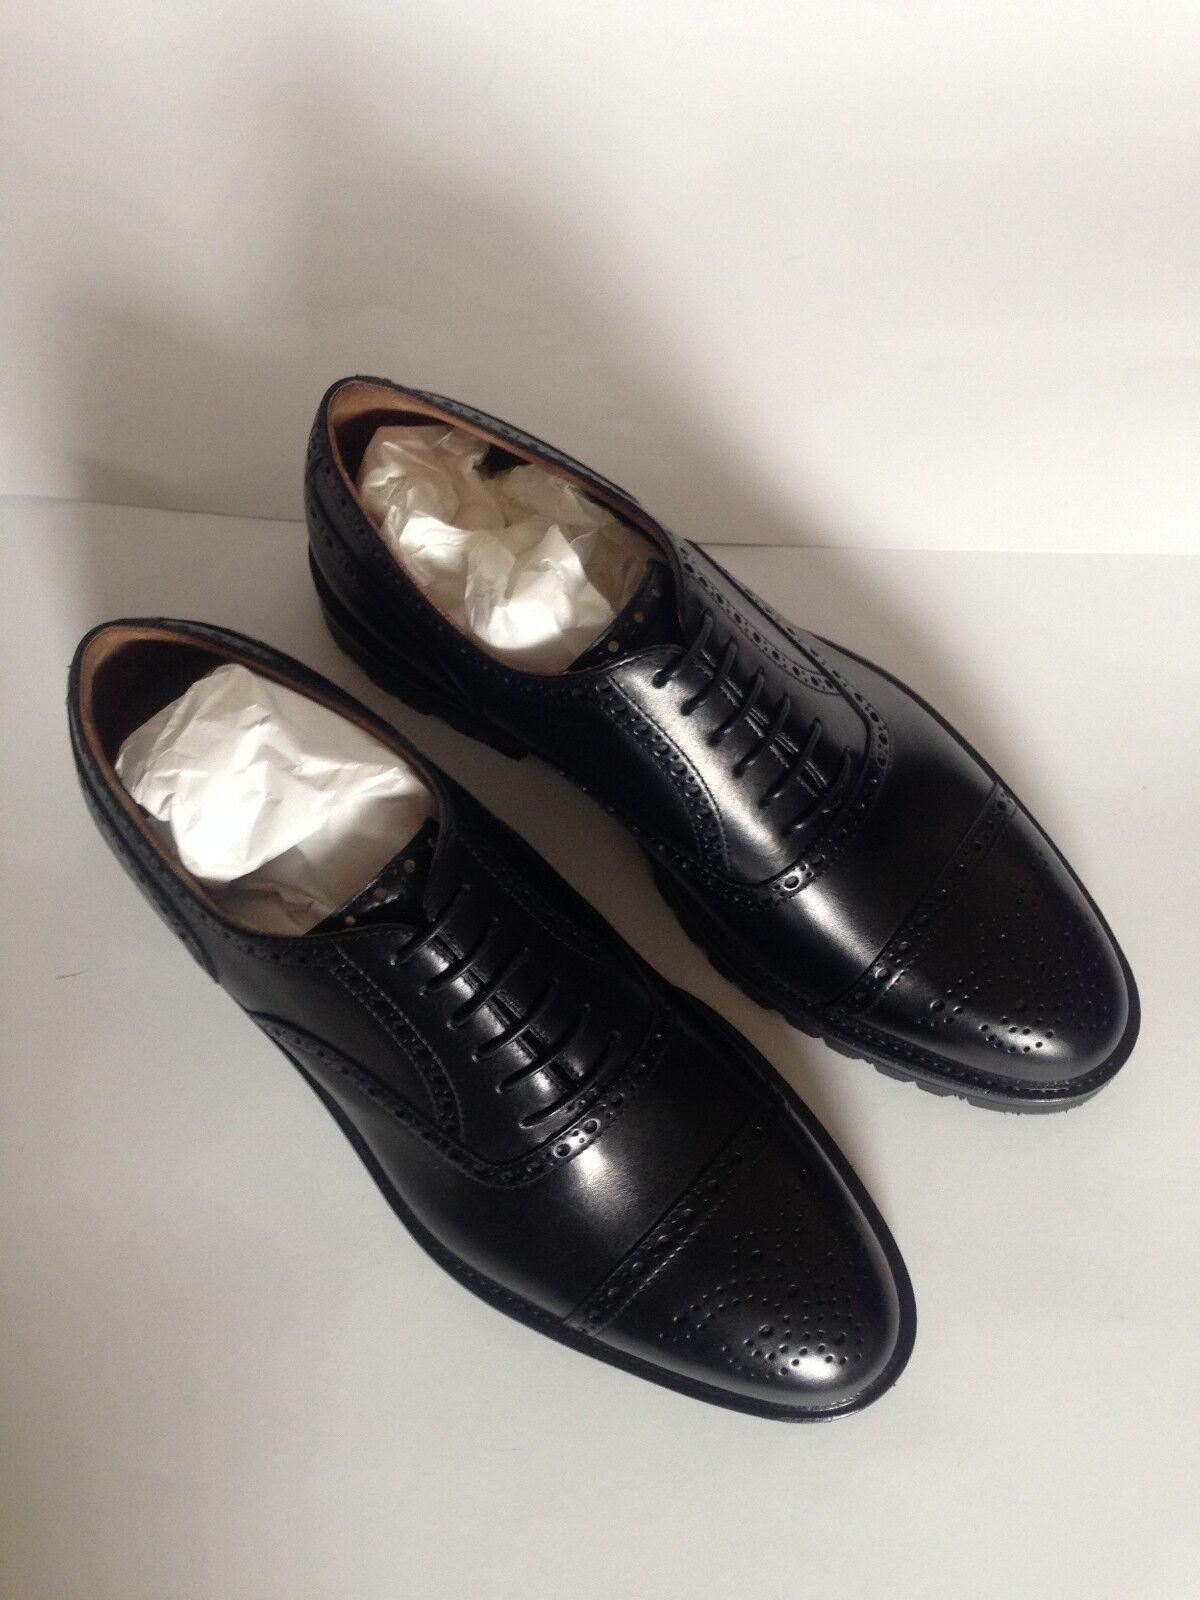 NIB Men Romano Martegani Cap Toe Oxford scarpe 9 nero Leather Stacked Heel